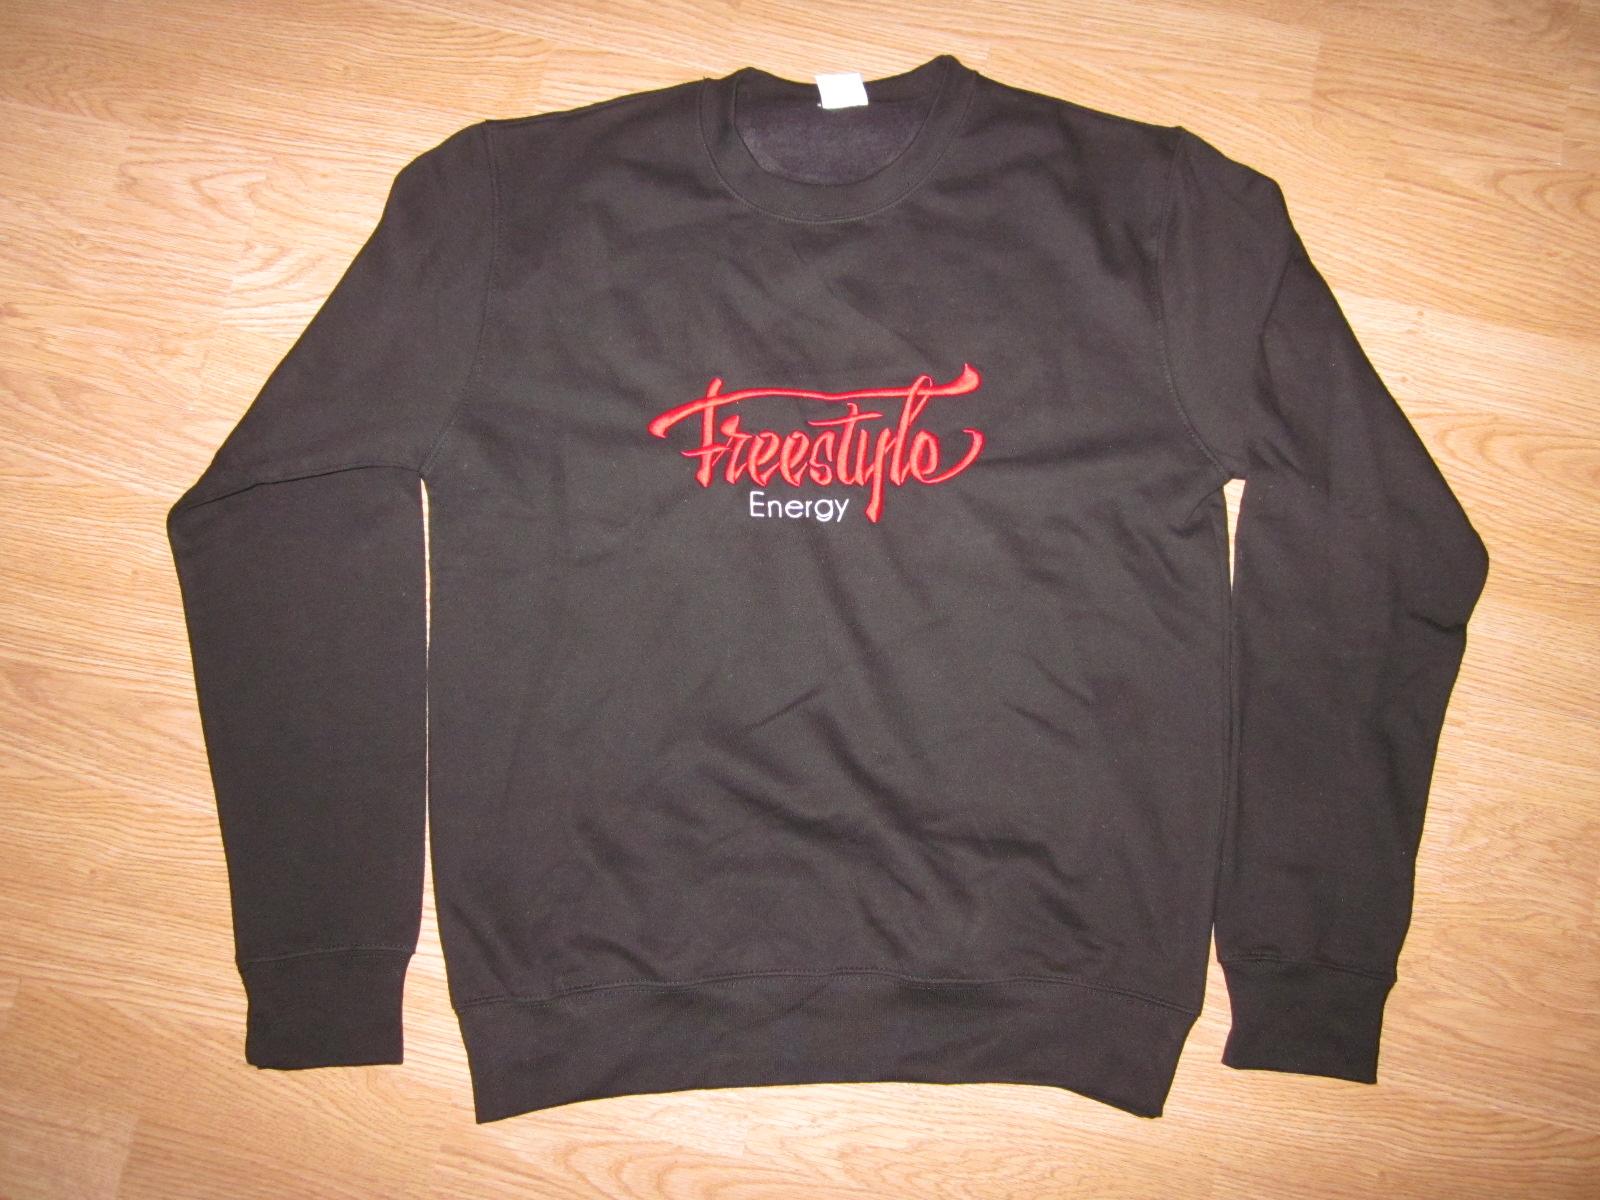 Freestyle Energy black hooded